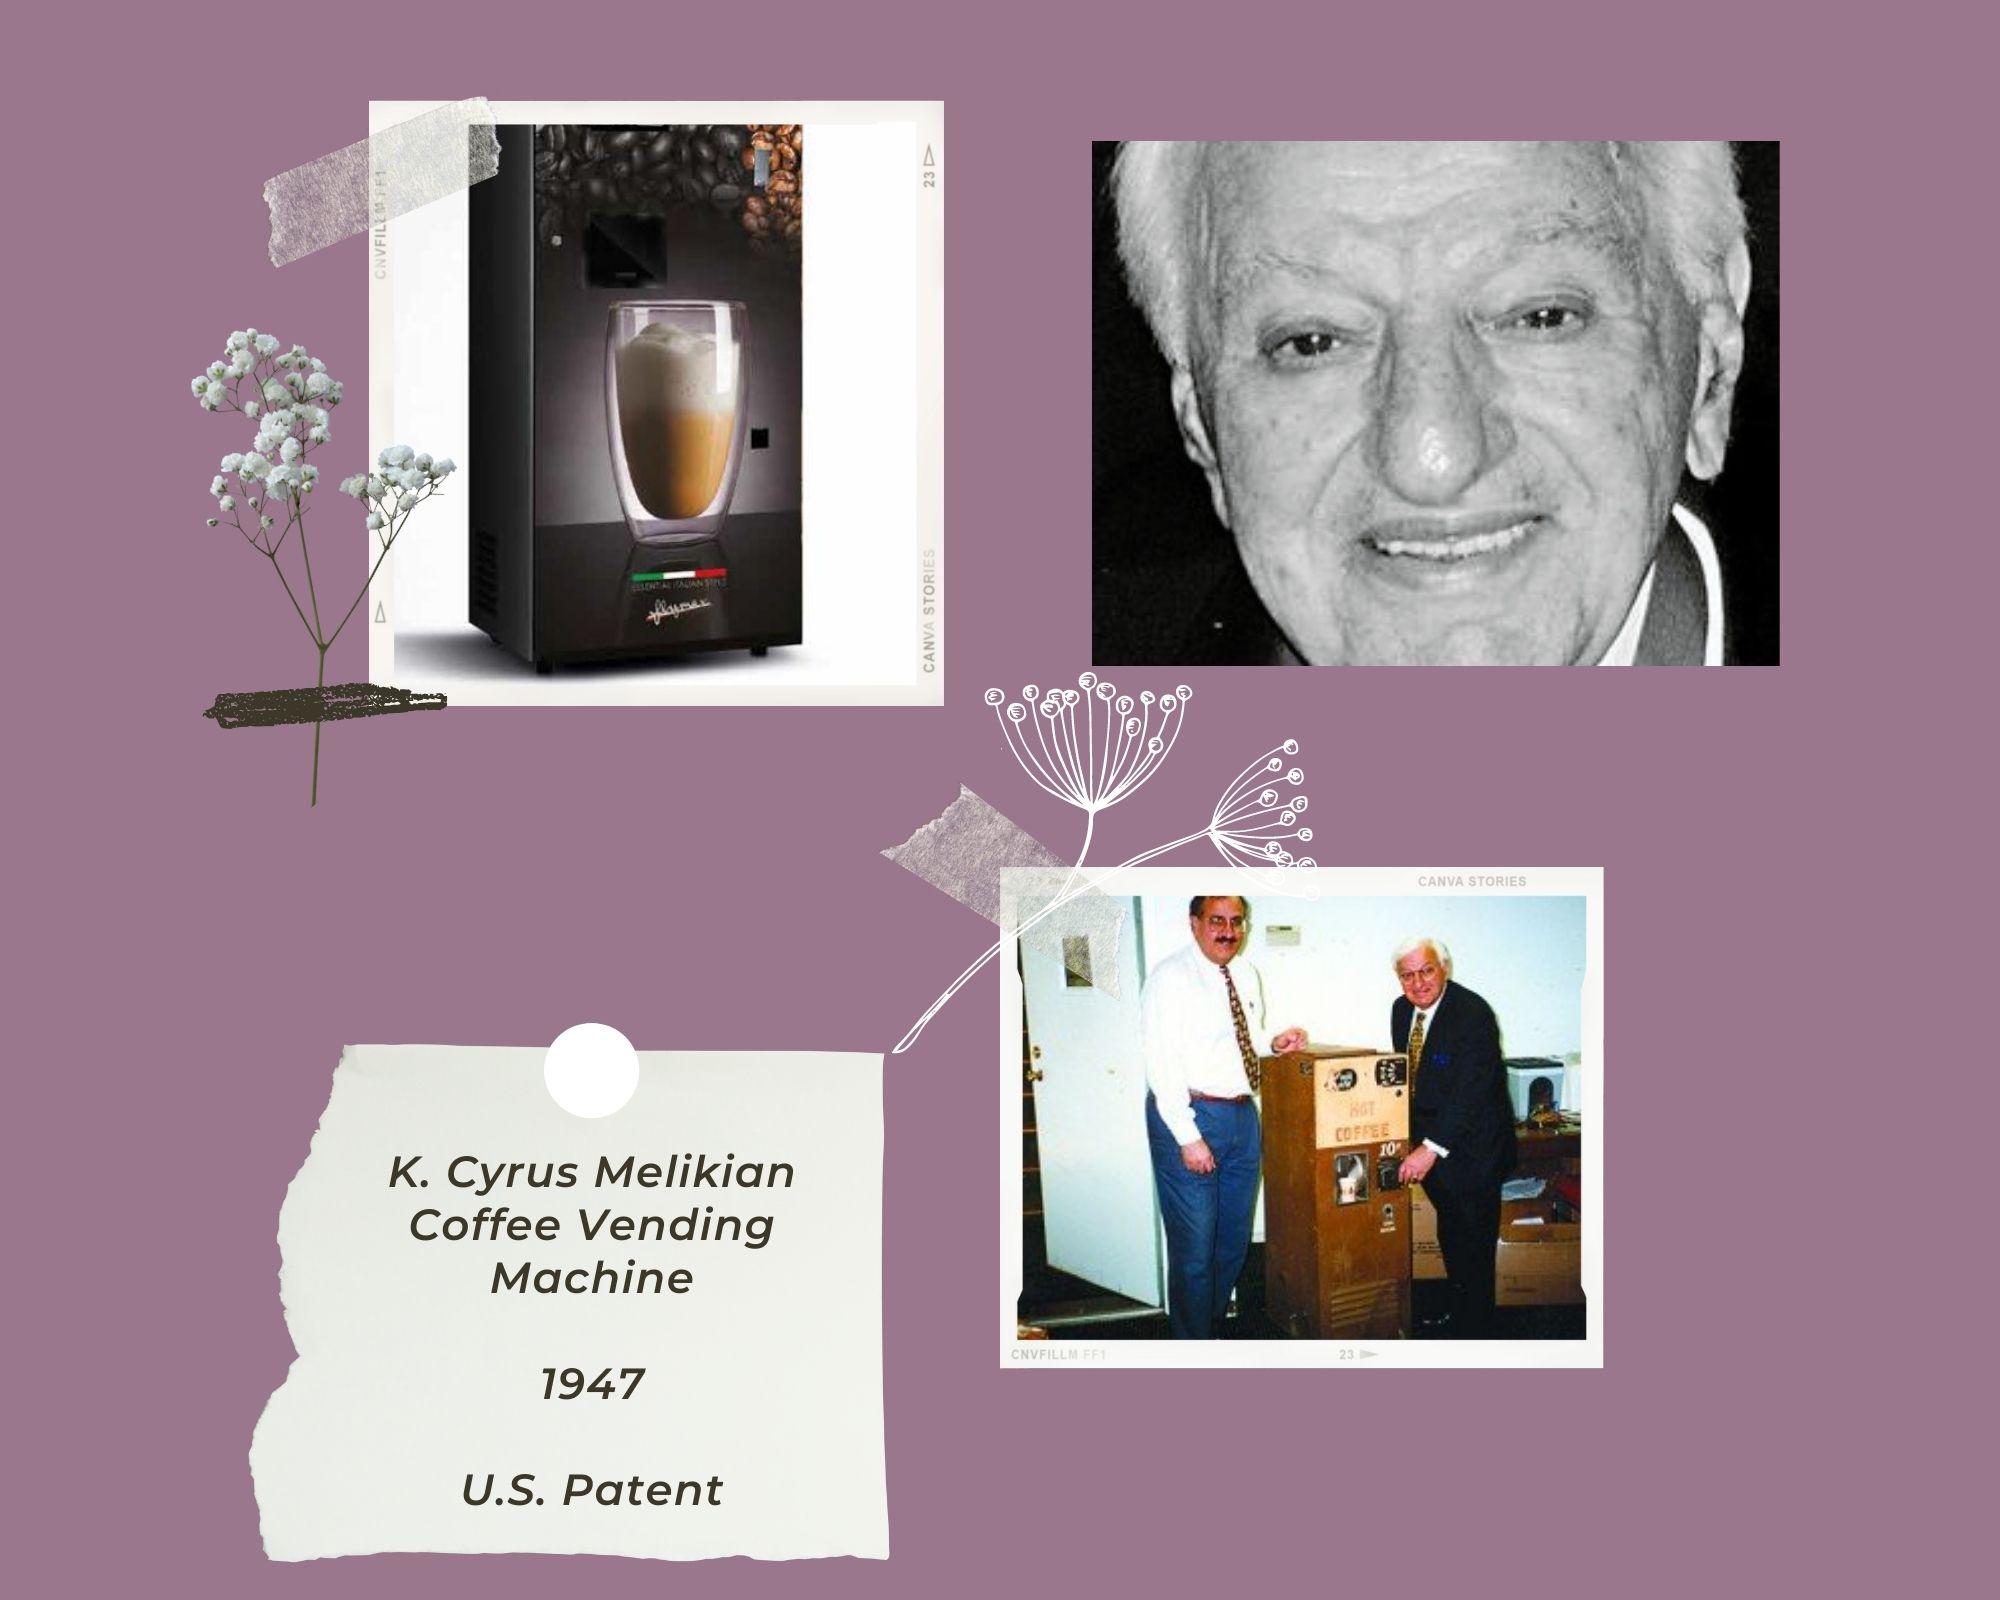 K. Cyrus Melikian coffee vending machine